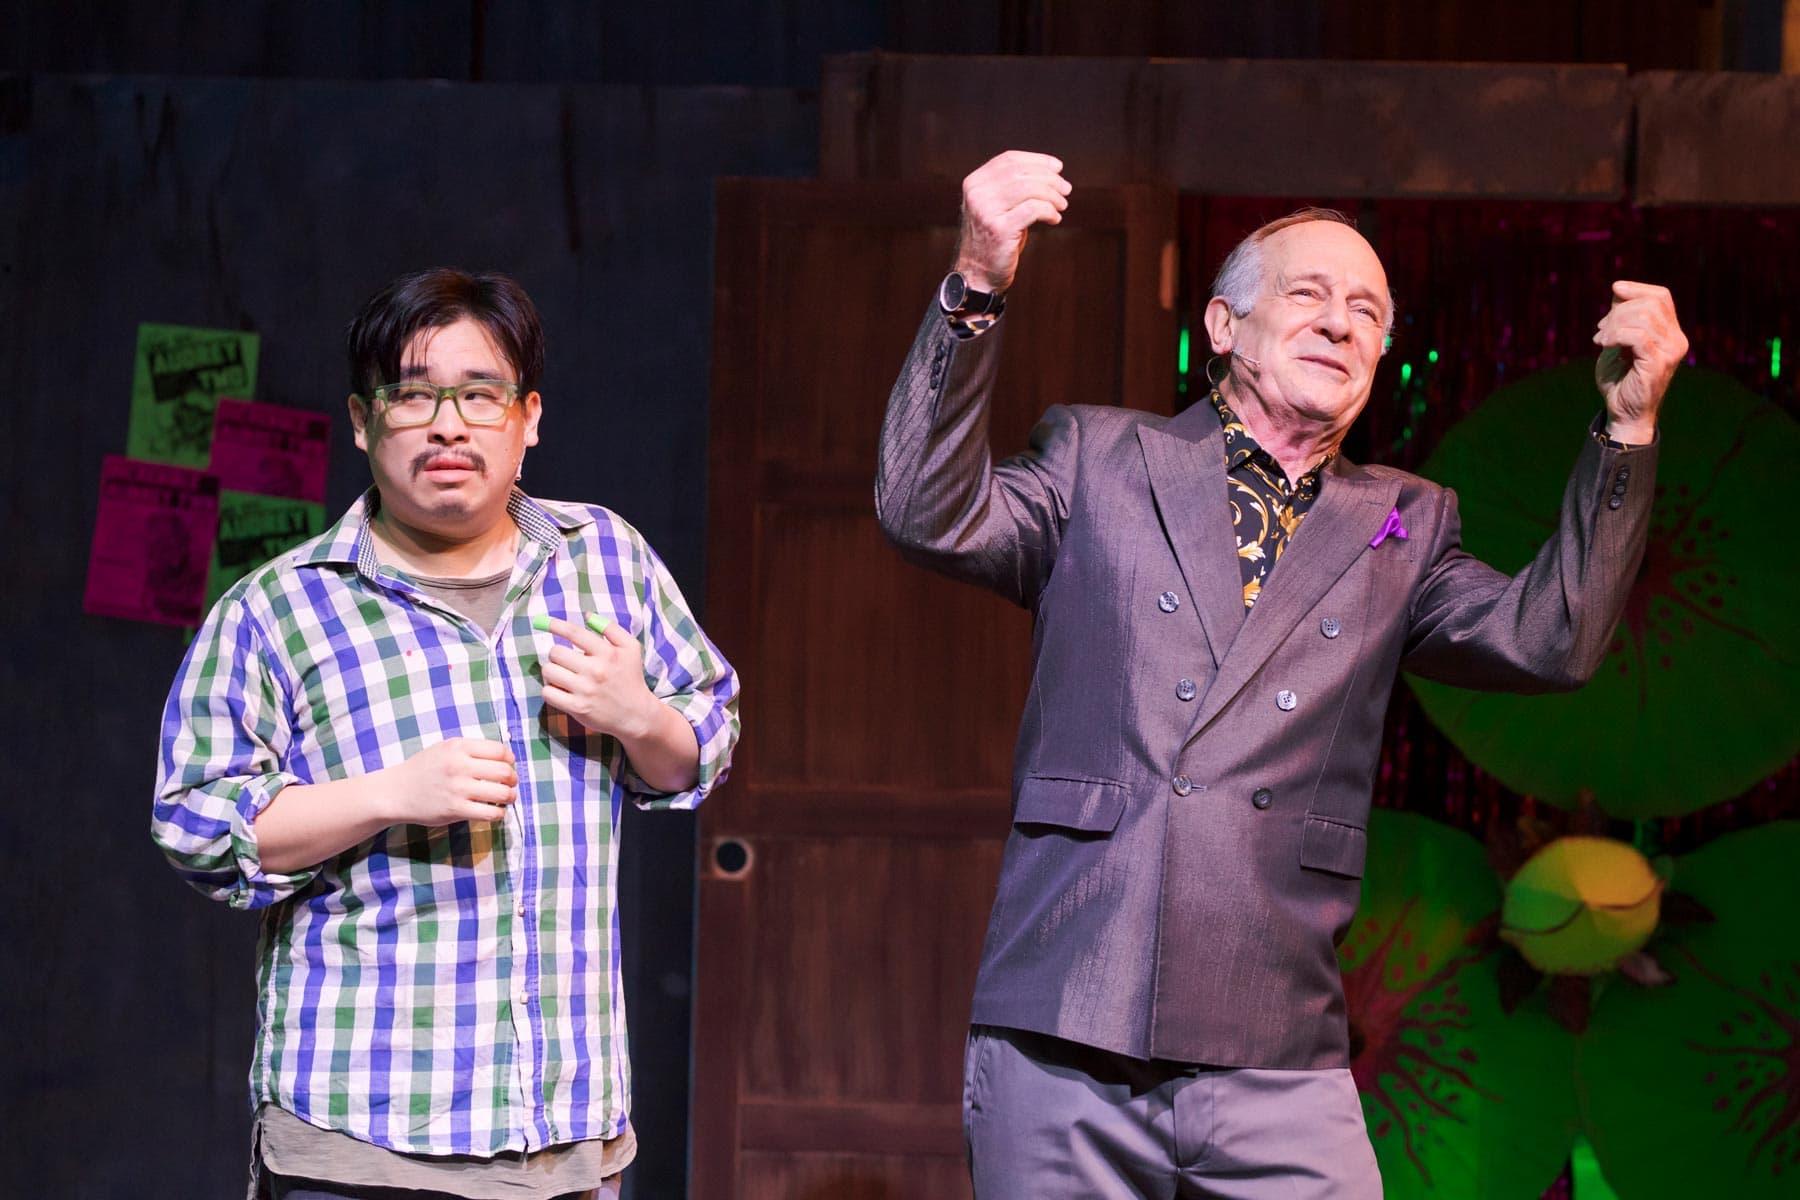 Phil Wong as Seymour and Jesse Caldwell as Mr. Mushnik celebrate Seymour's adoption into Mr. Mushnik's family.